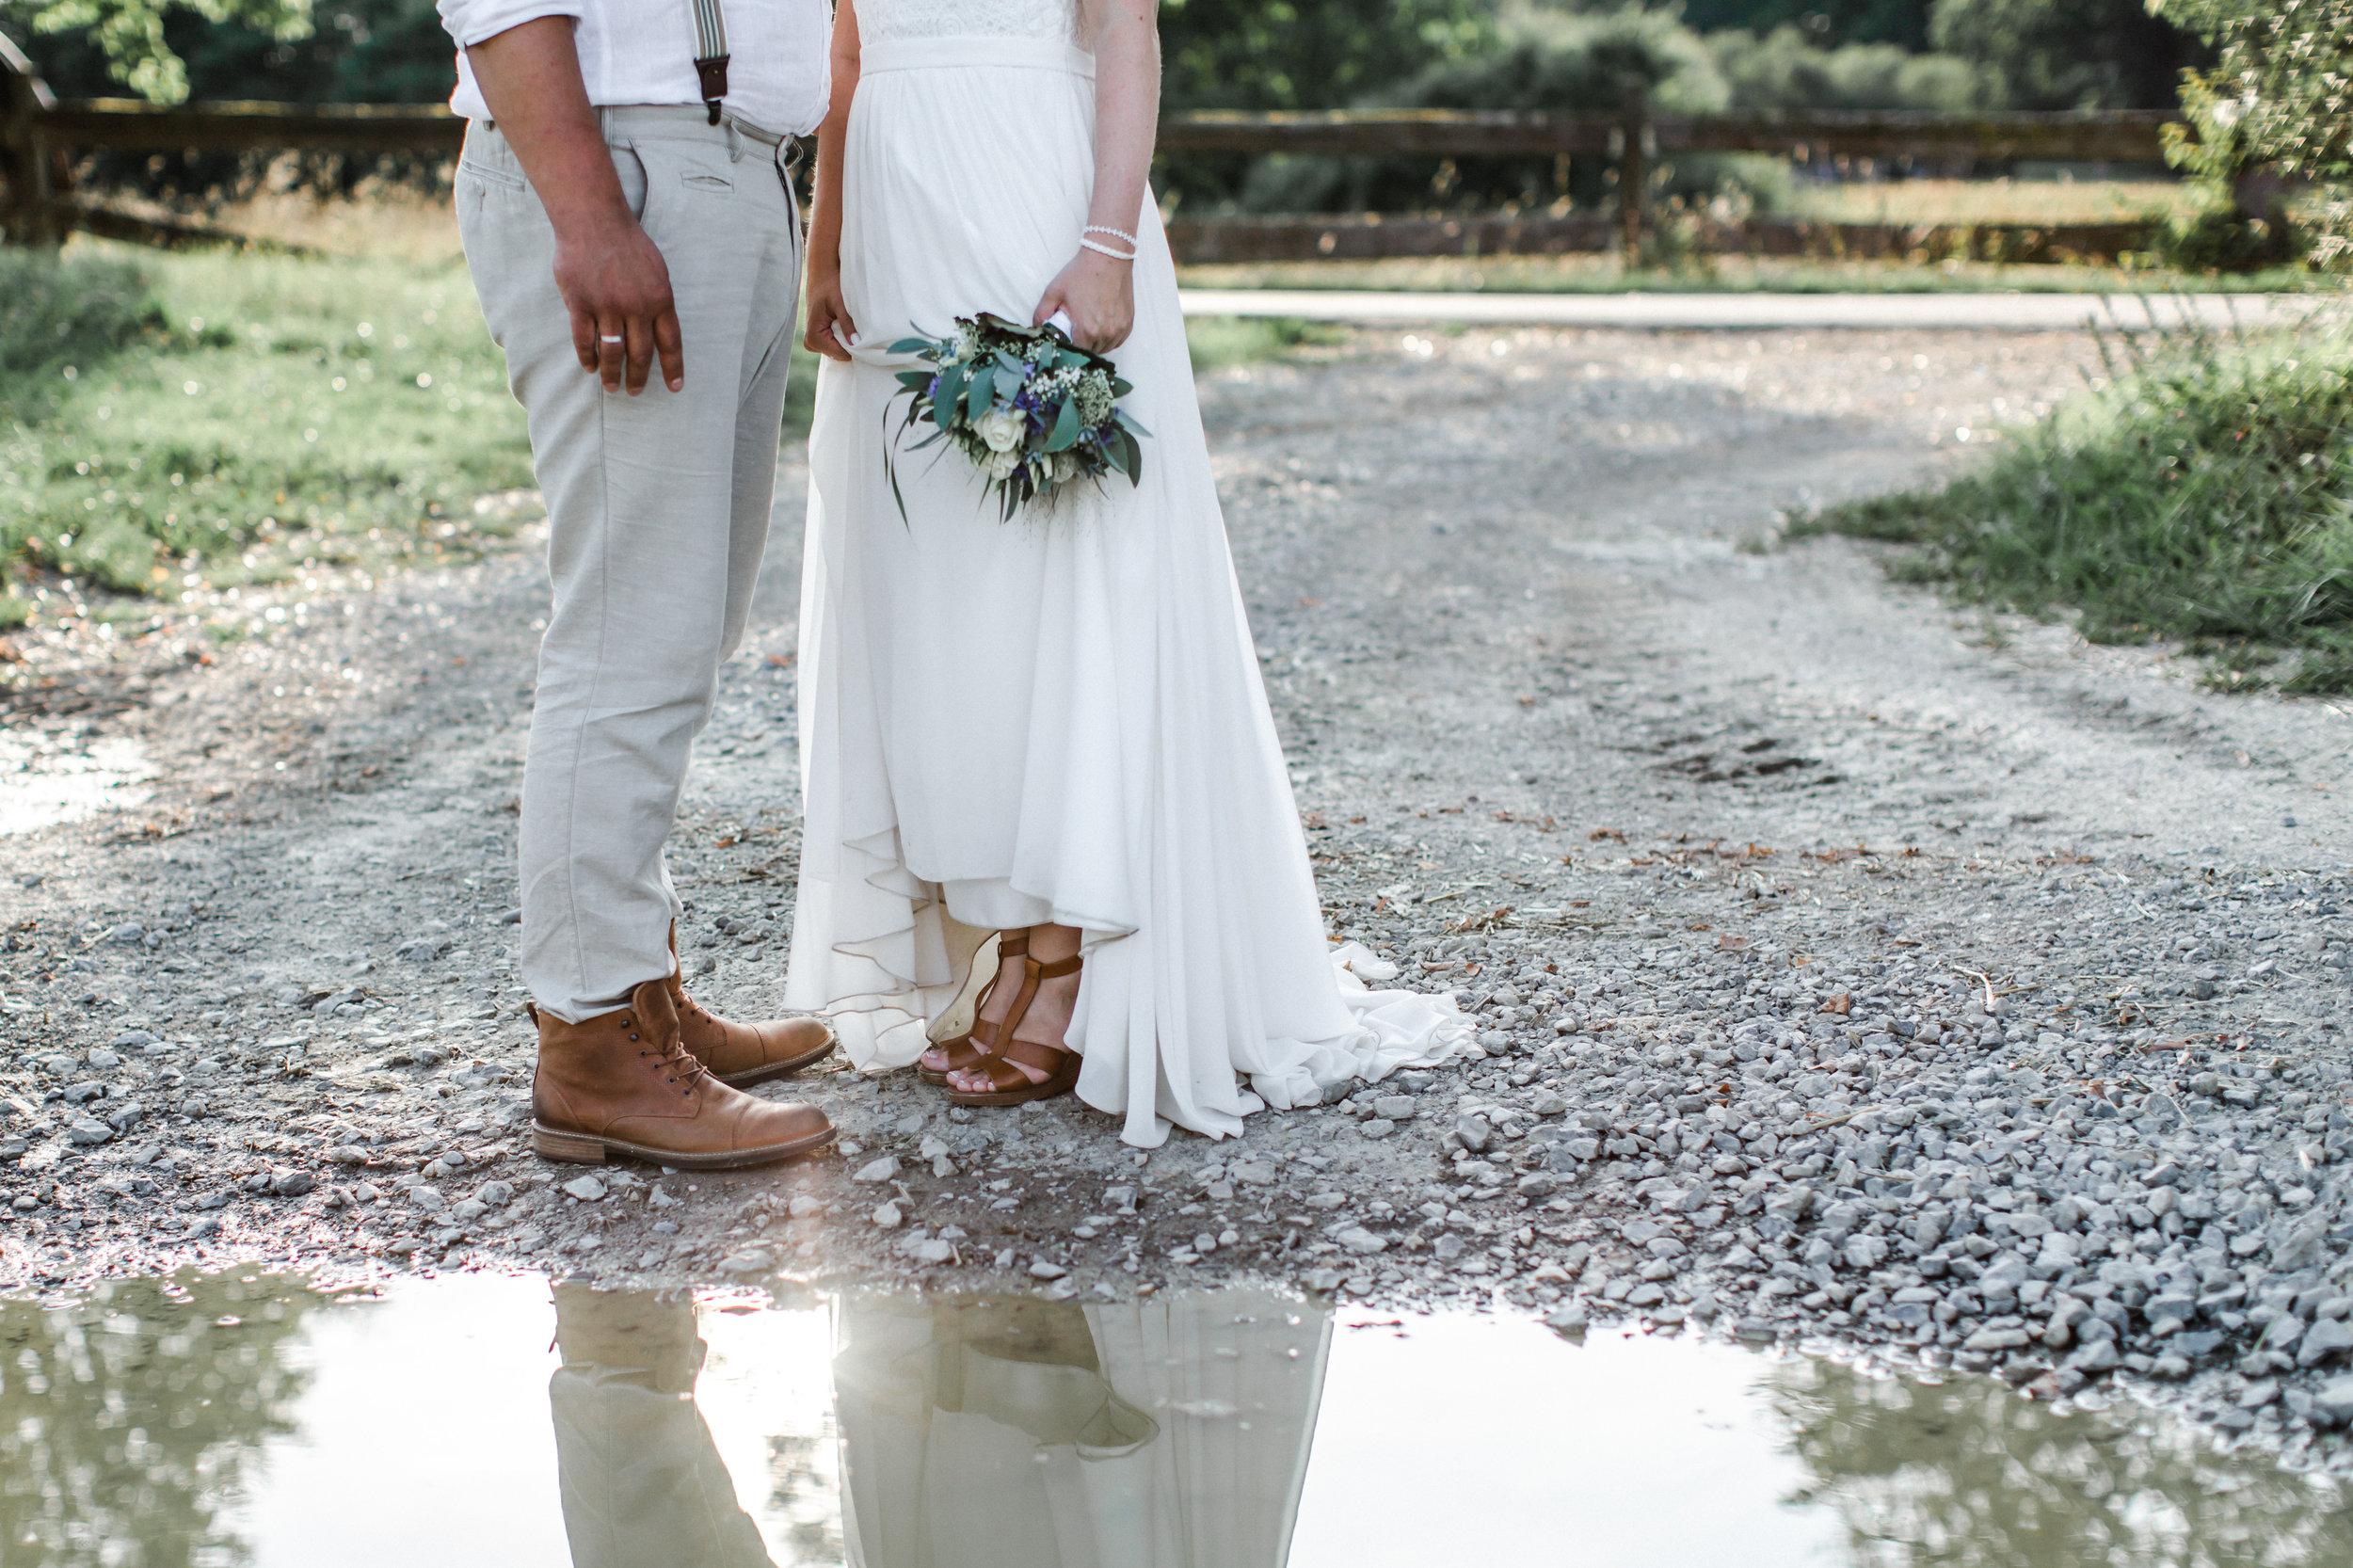 yessica-baur-fotografie-after-wedding-tübingen-033-9096.JPG